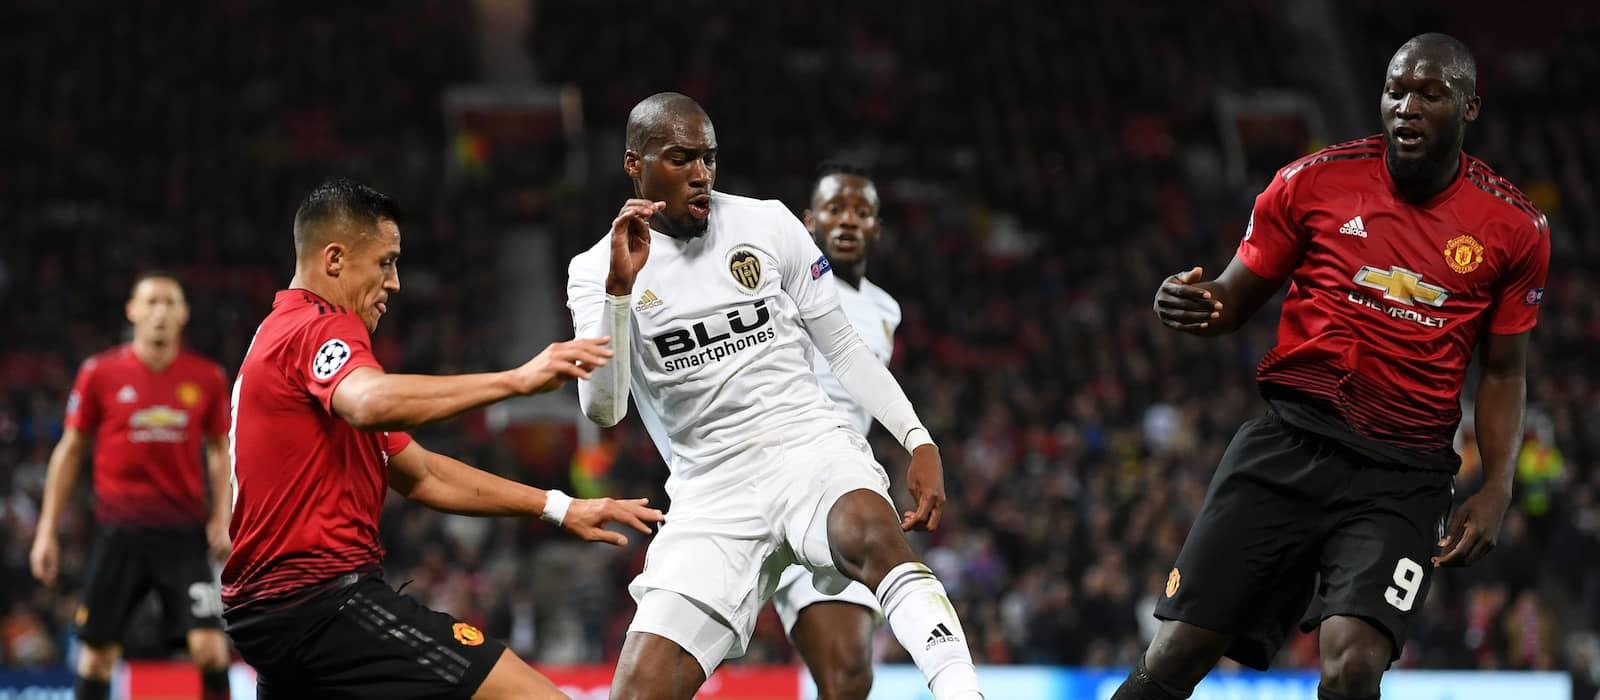 Photo gallery: Manchester United 0-0 Valencia